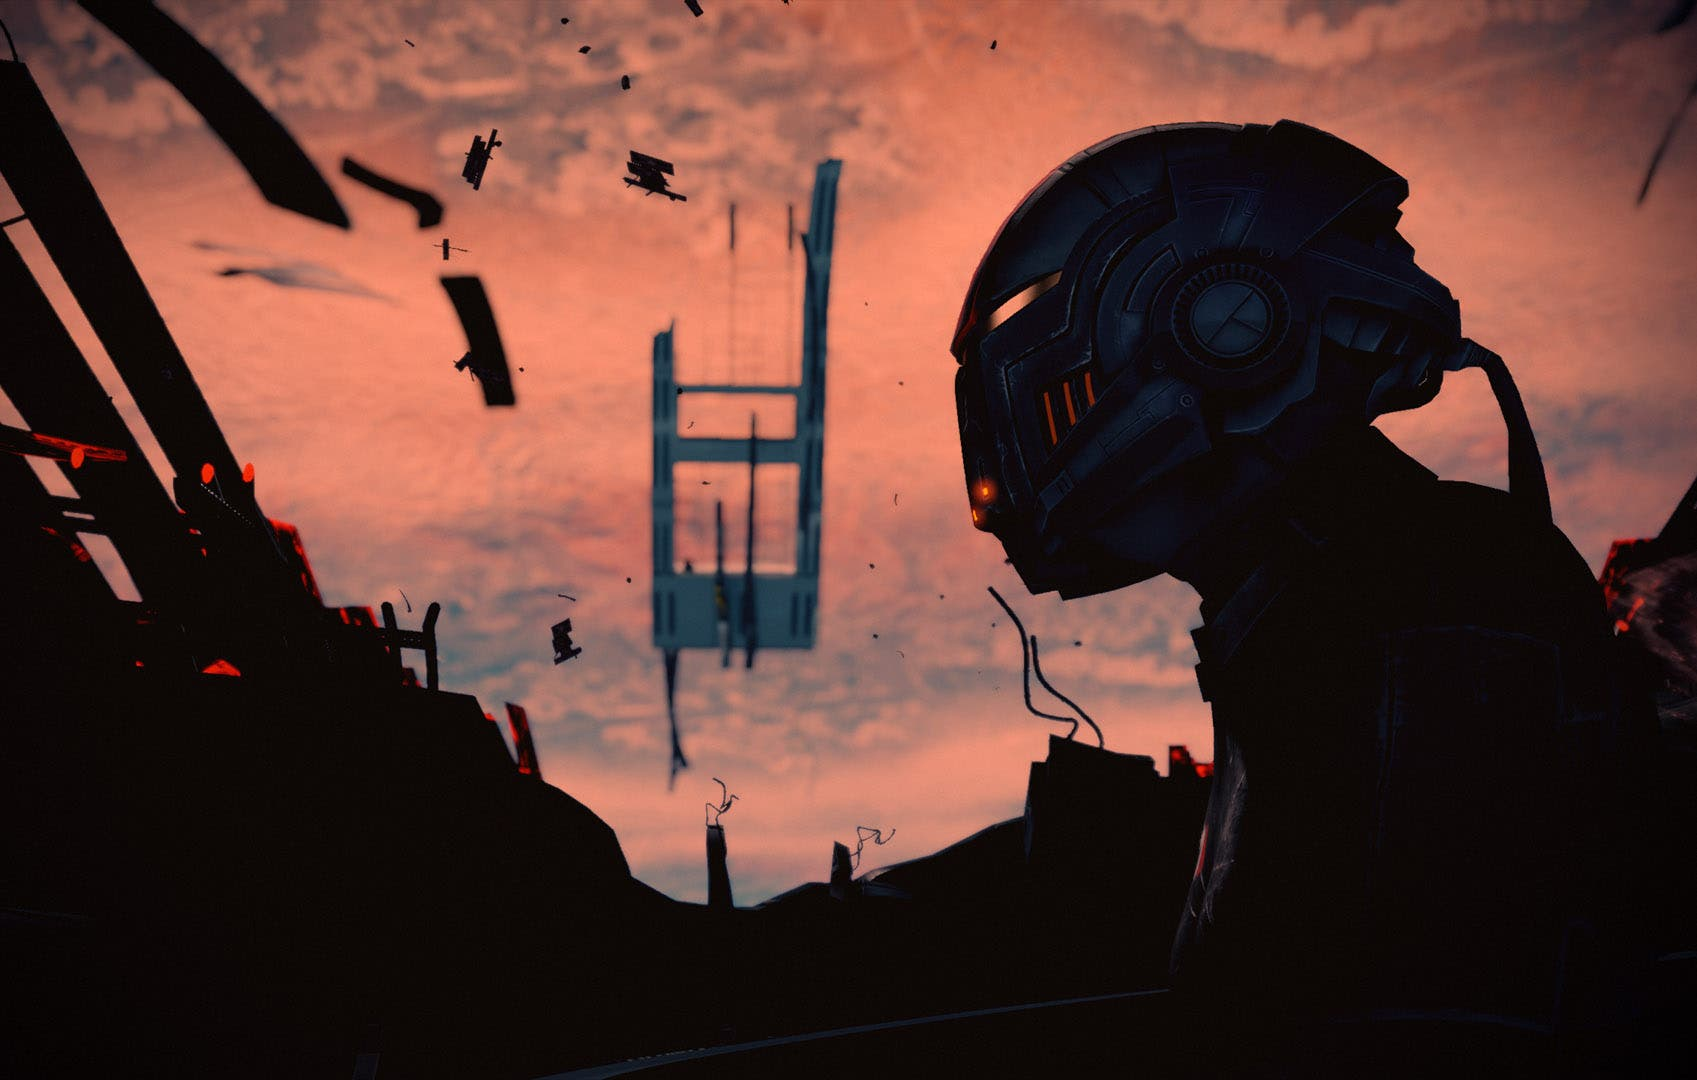 En qué orden jugar los DLCs de Mass Effect 2 en Mass Effect: Legendary Edition 5